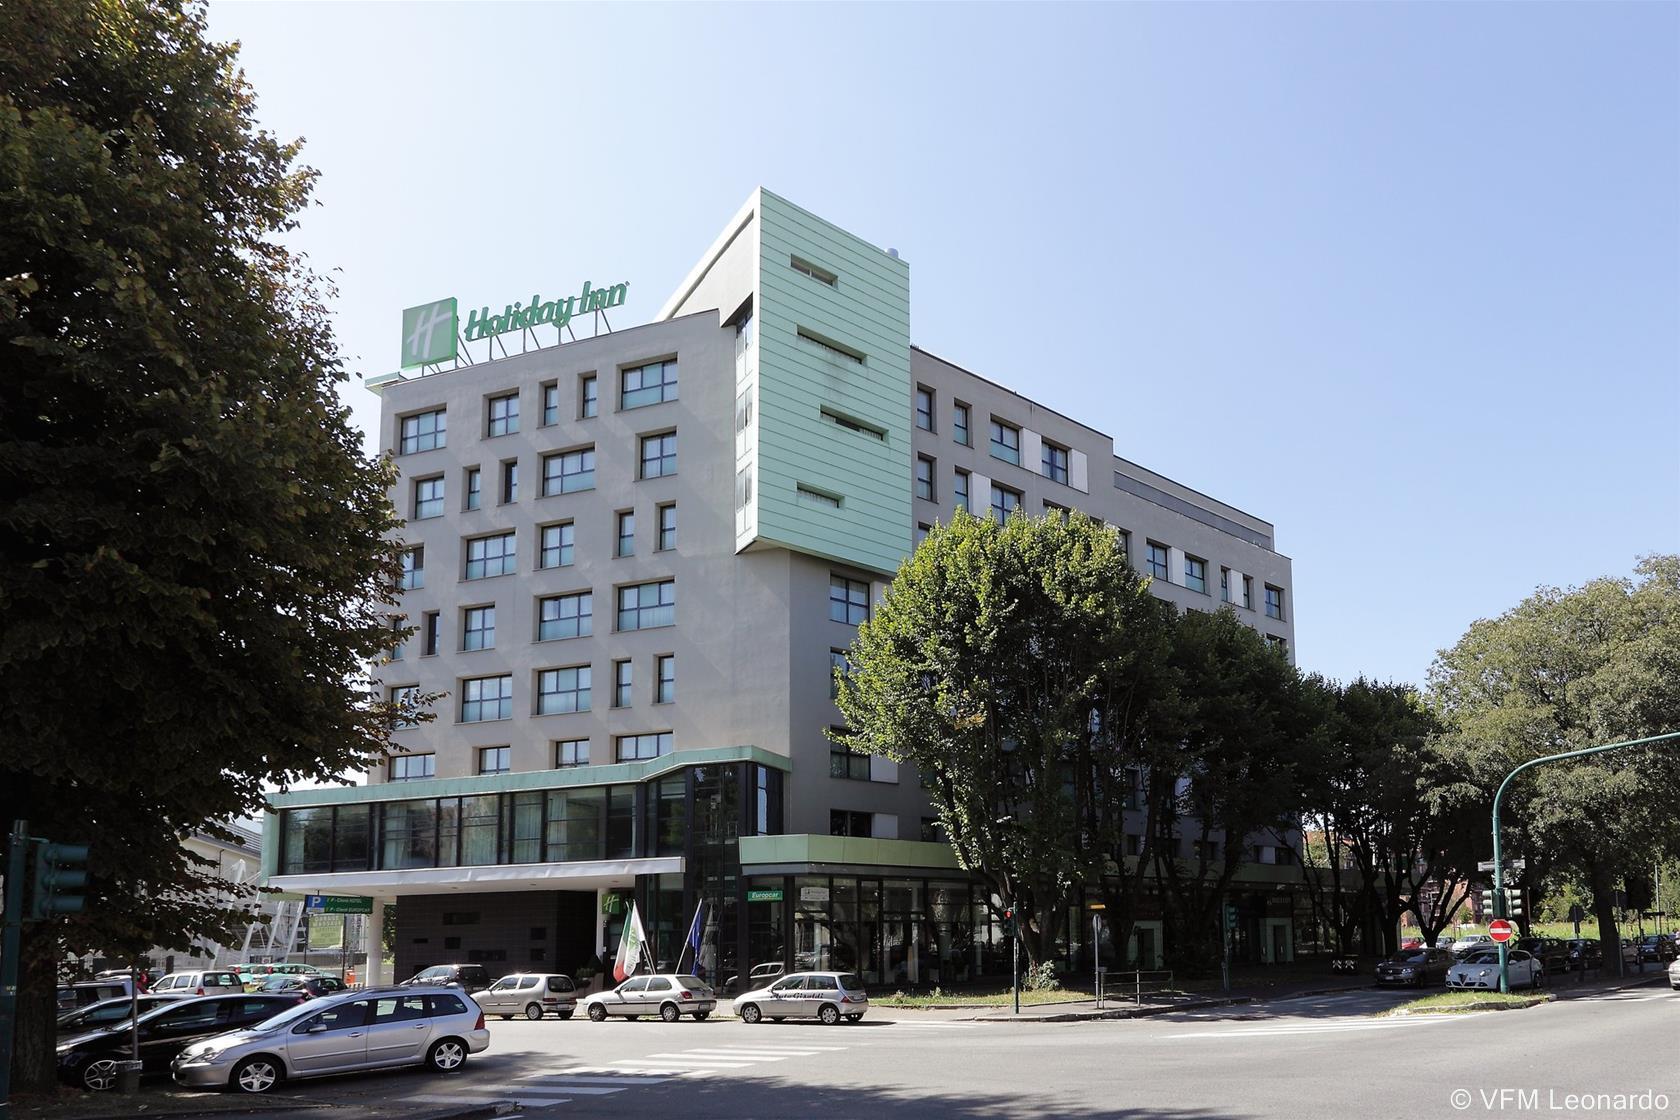 Hotel Ibis Styles Turin